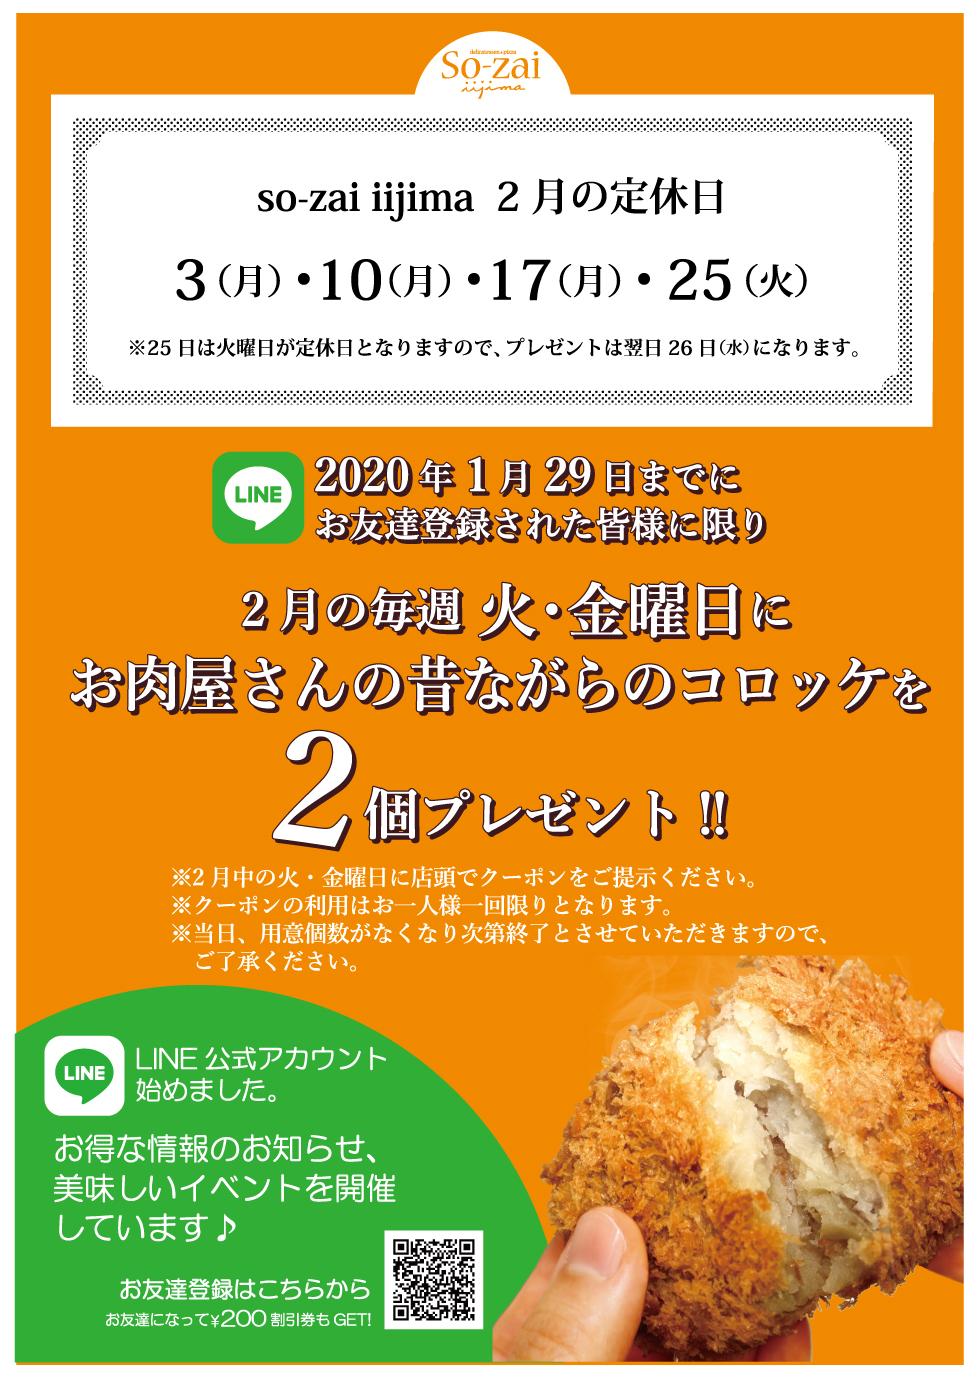 【LINE友達限定】お肉屋さんのコロッケプレゼントキャンペーン【SO-ZAI】